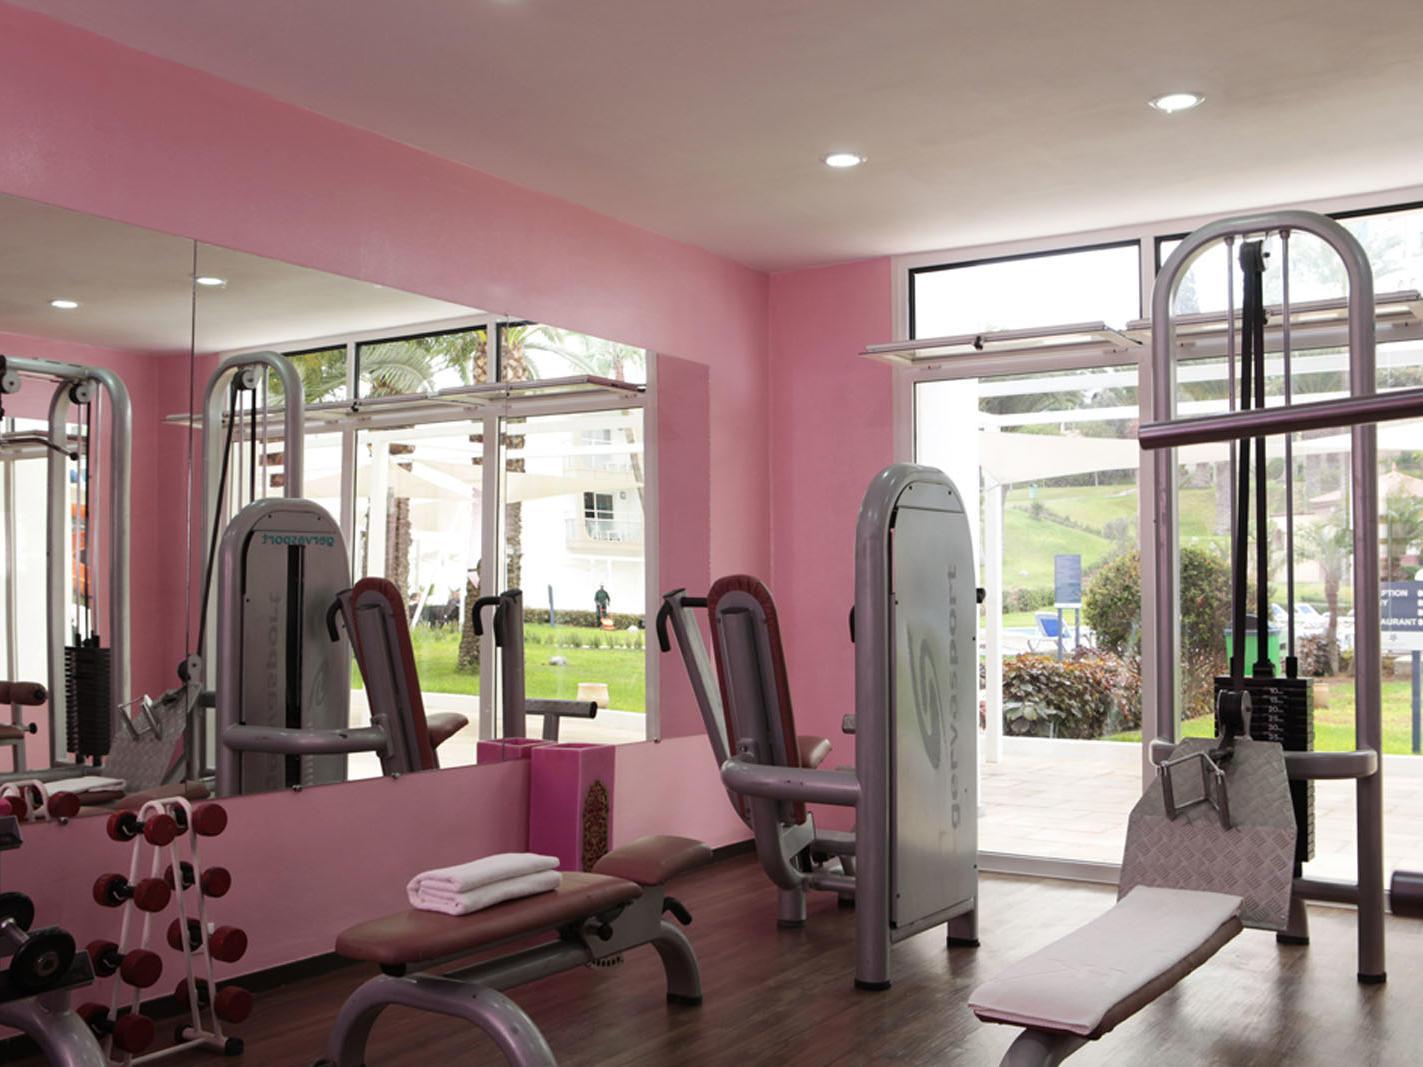 Gym at Kenzi Europa All Inclusive Hotel in Agadir, Morocco